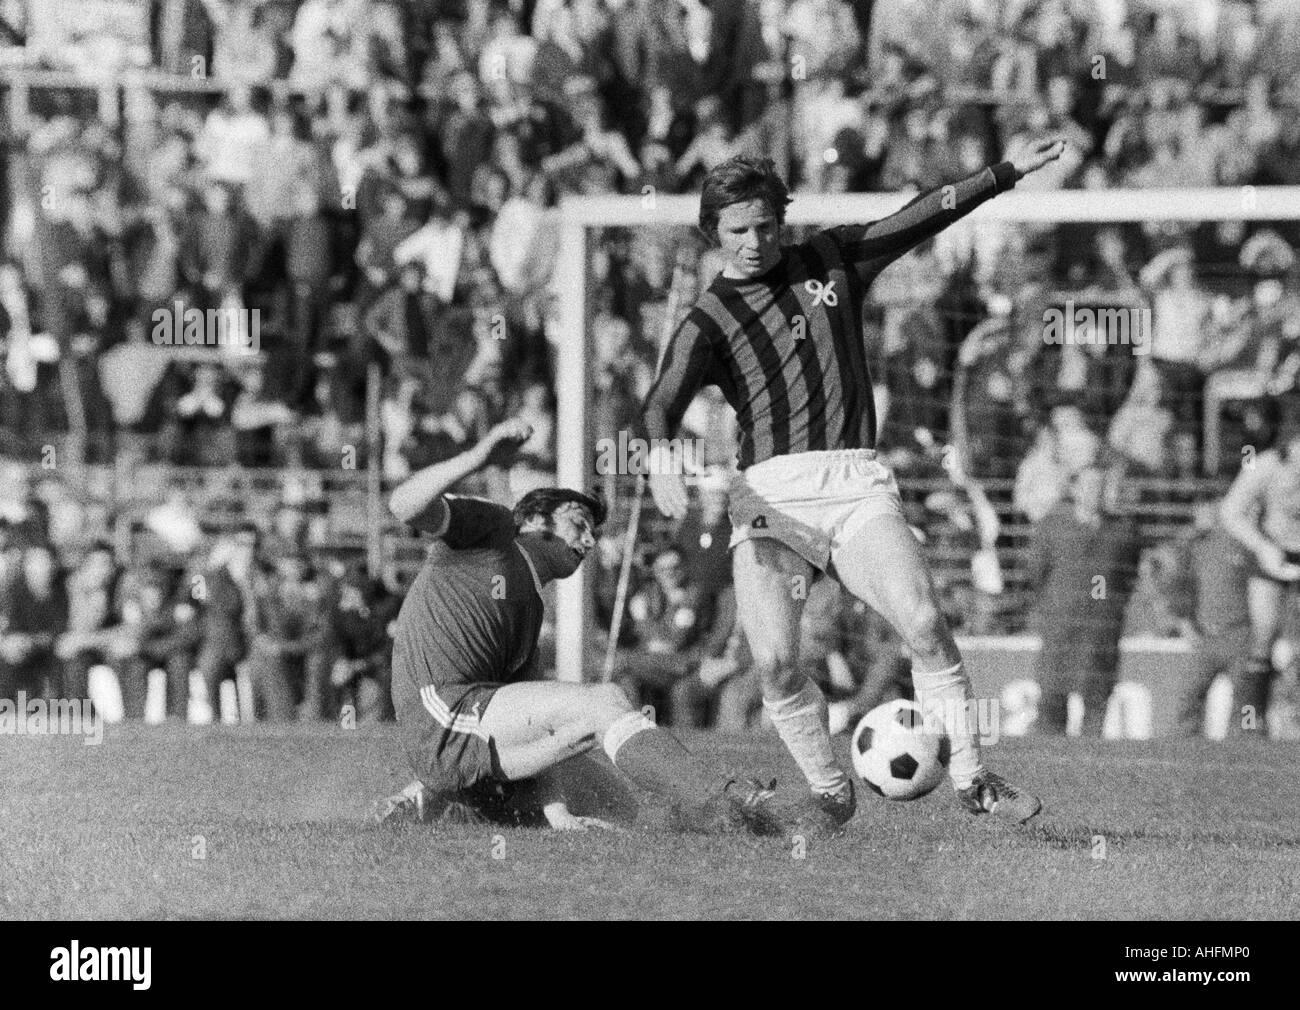 football, Bundesliga, 1971/1972, VfL Bochum versus Hanover 96 2:2, Stadium at the Castroper Strasse in Bochum, scene of the match, duel between Hans Walitza (Bochum) left and Peter Anders (96) - Stock Image